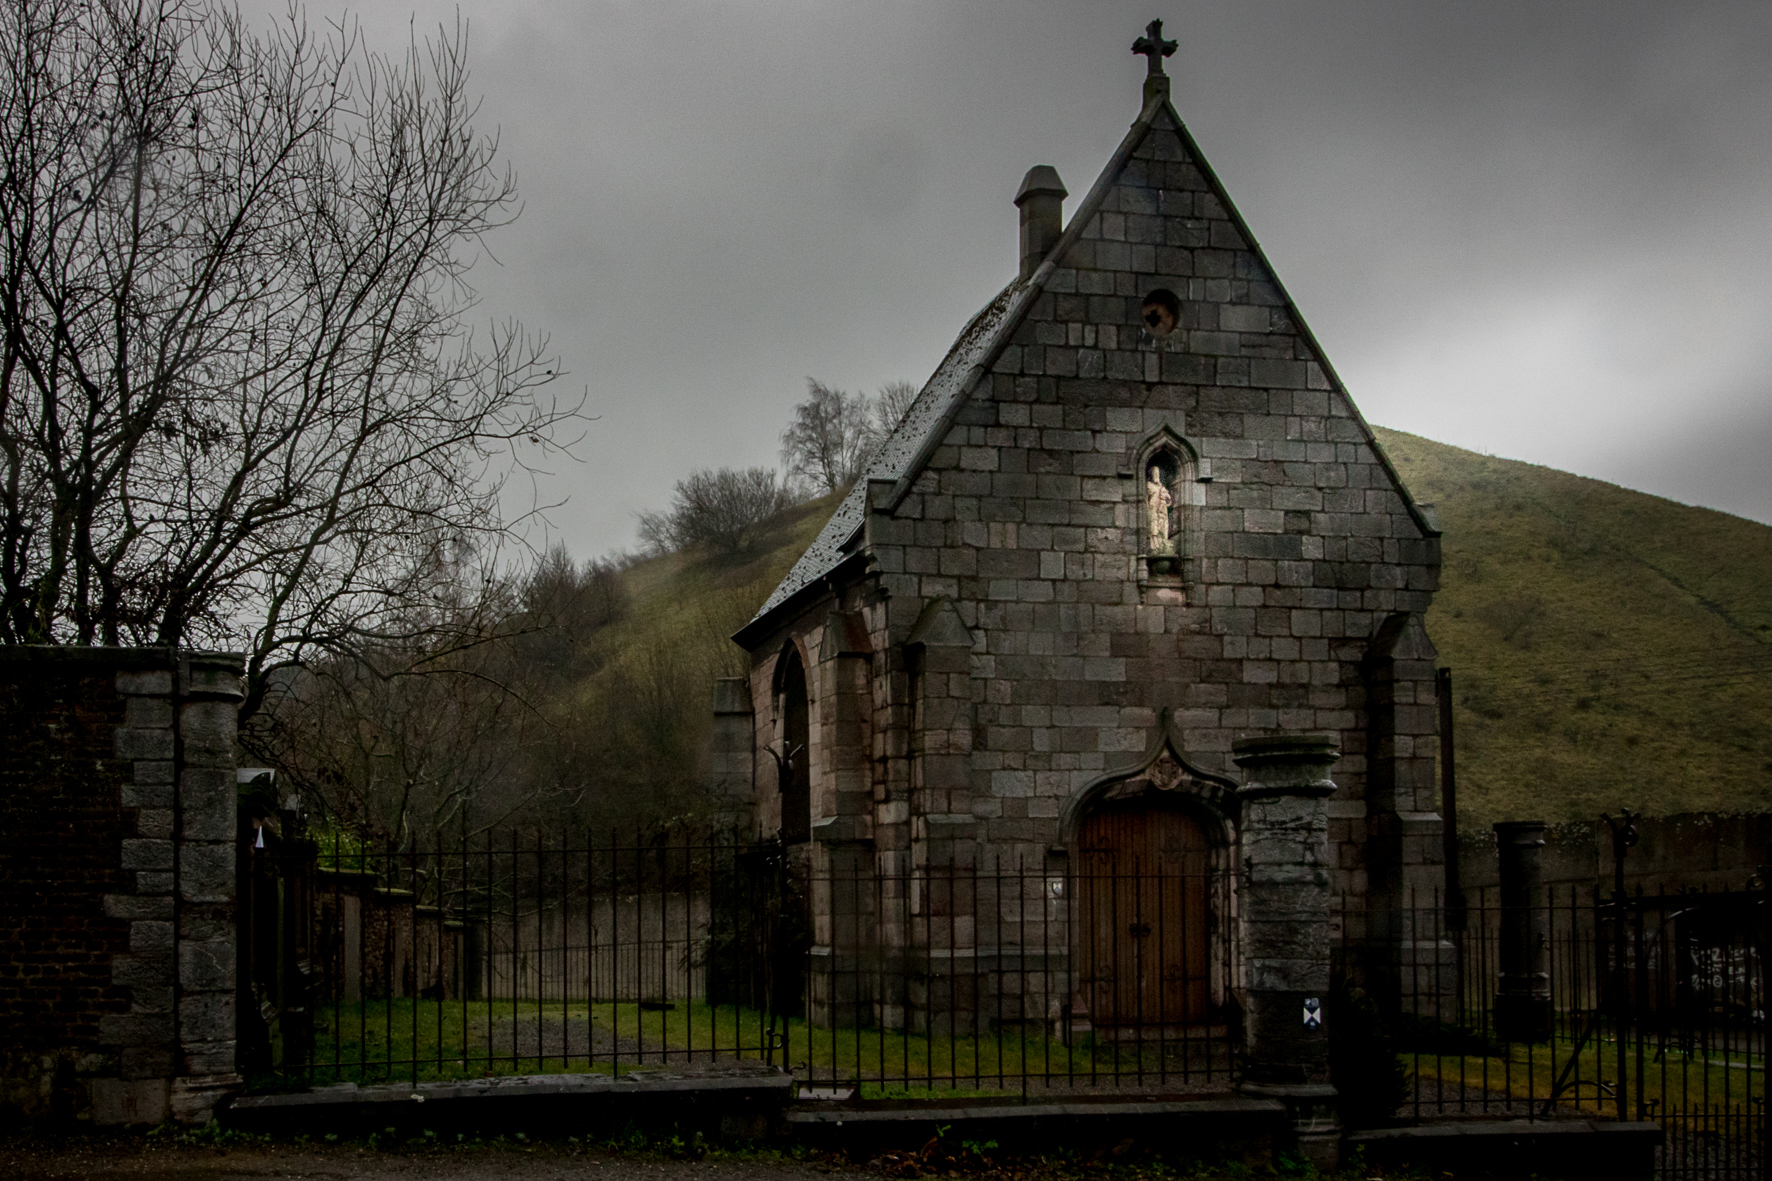 Chapelle de Dampremy, Belgium